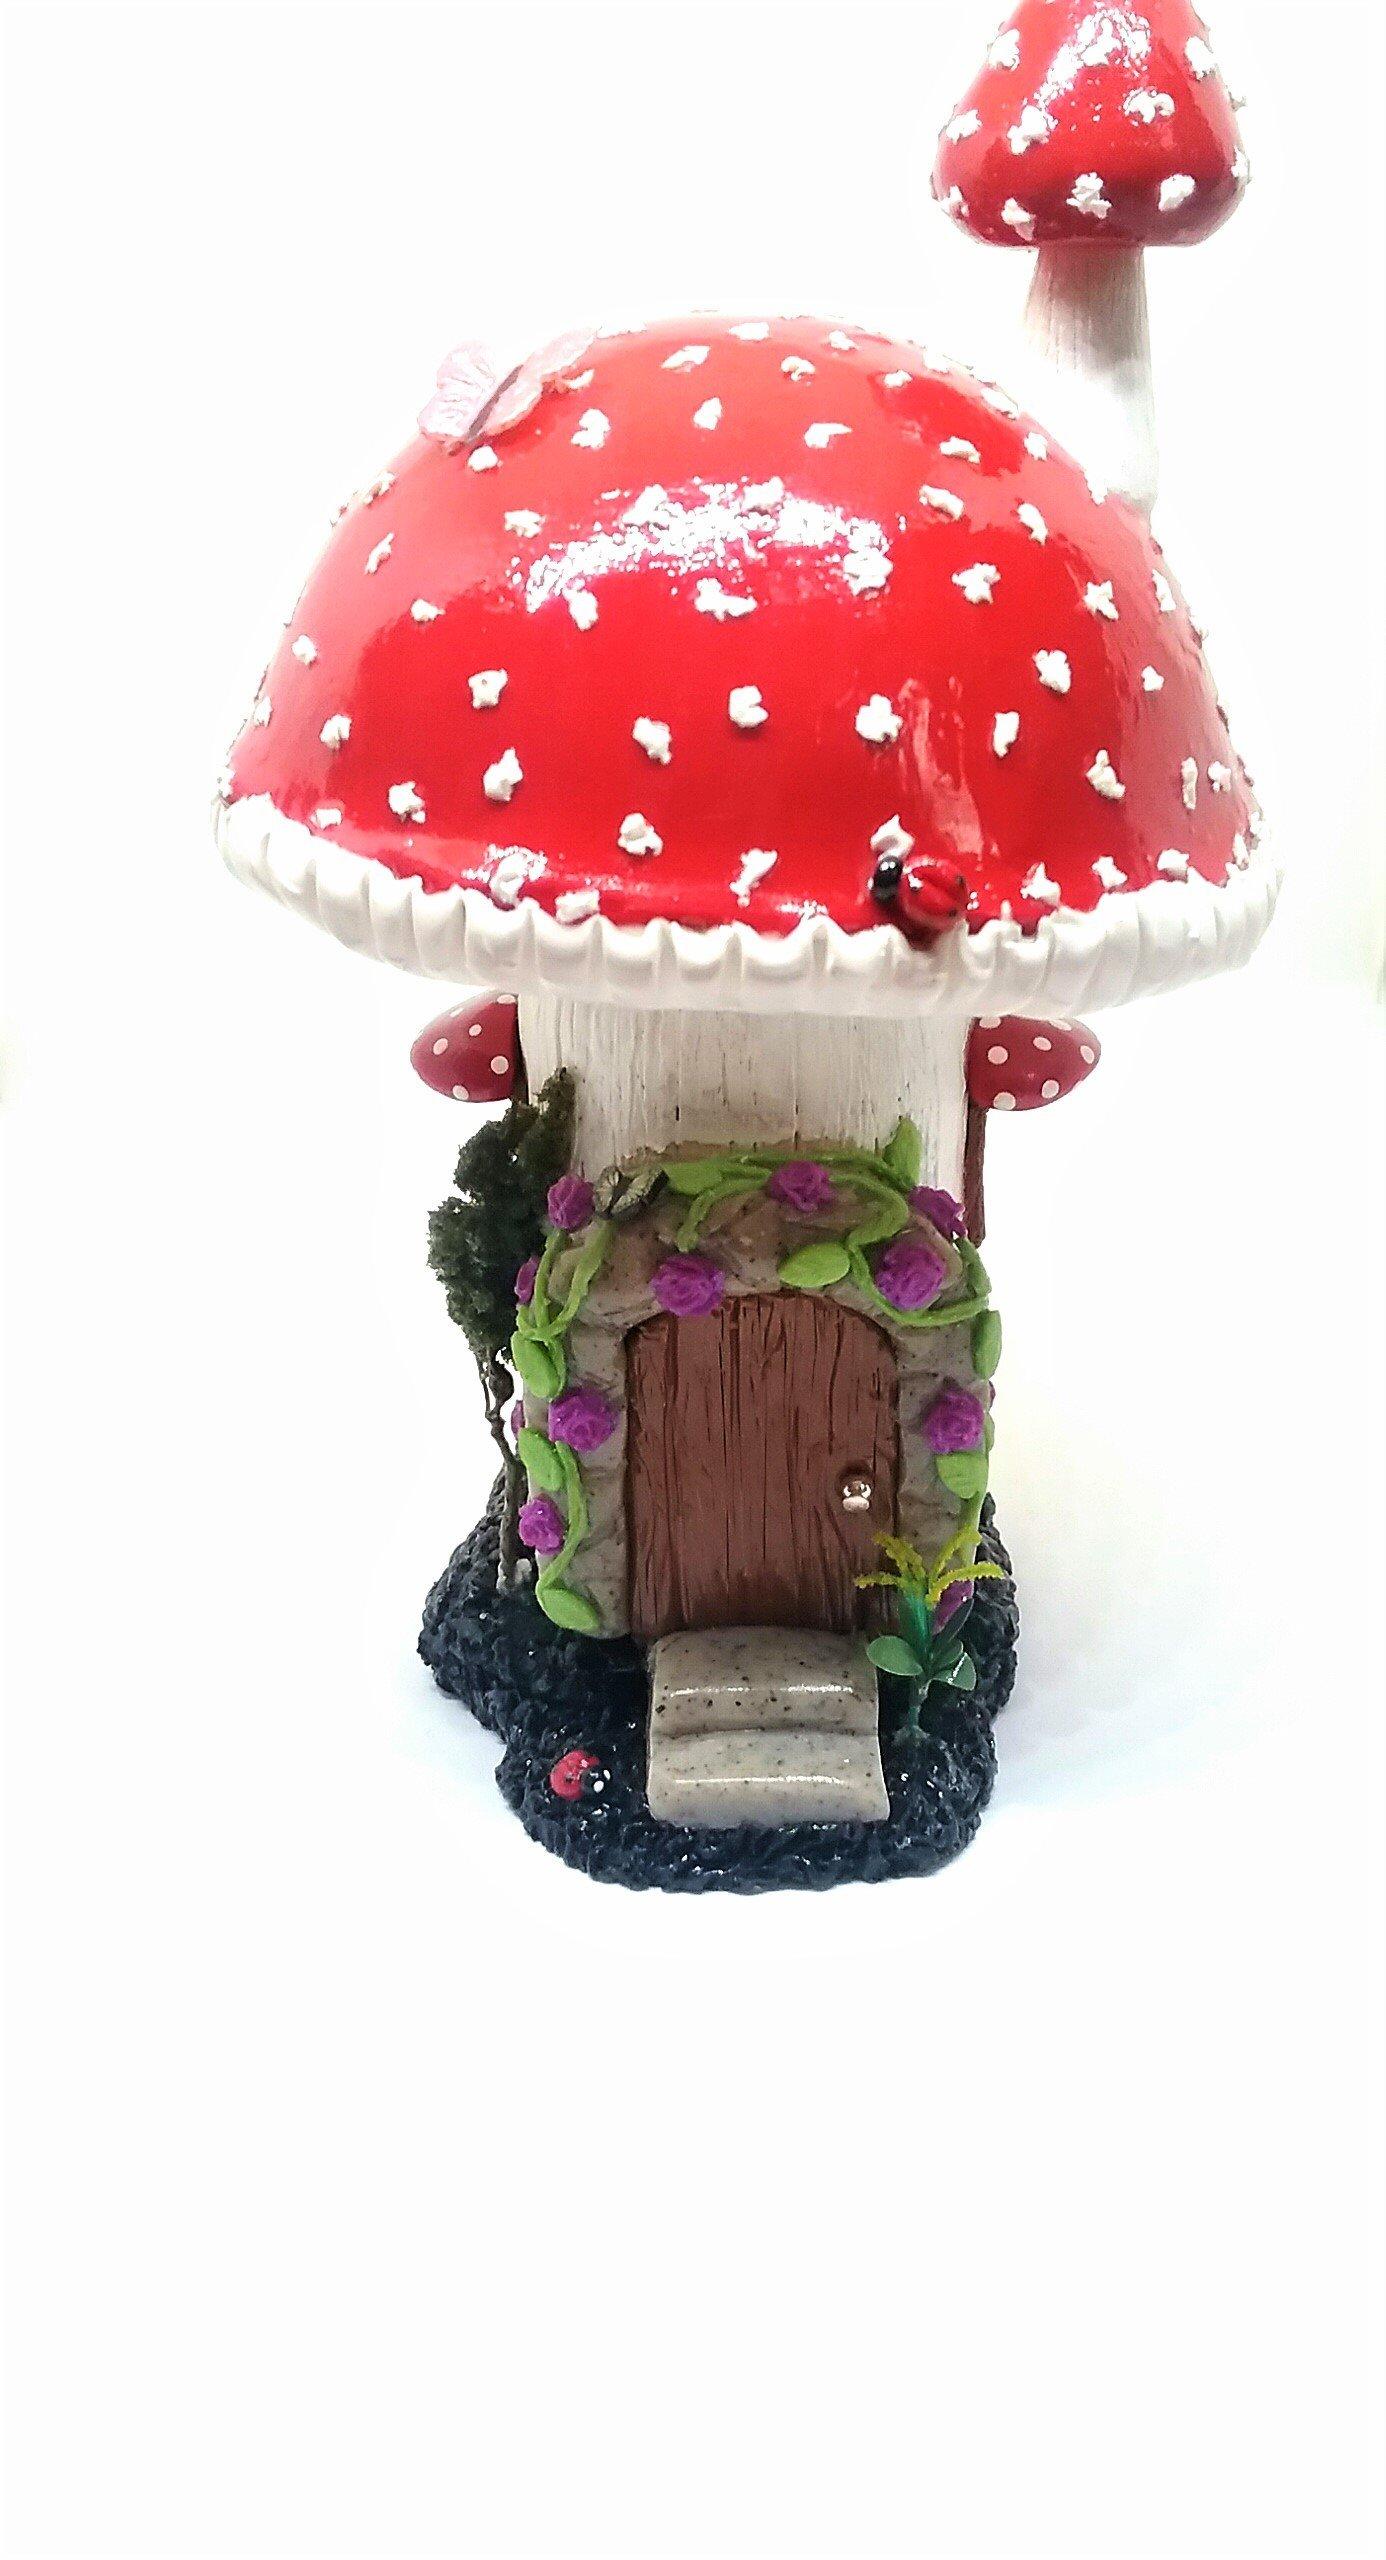 Miniature fairy red mushroom house with glow ion the dark windows. Fairy garden accessories.